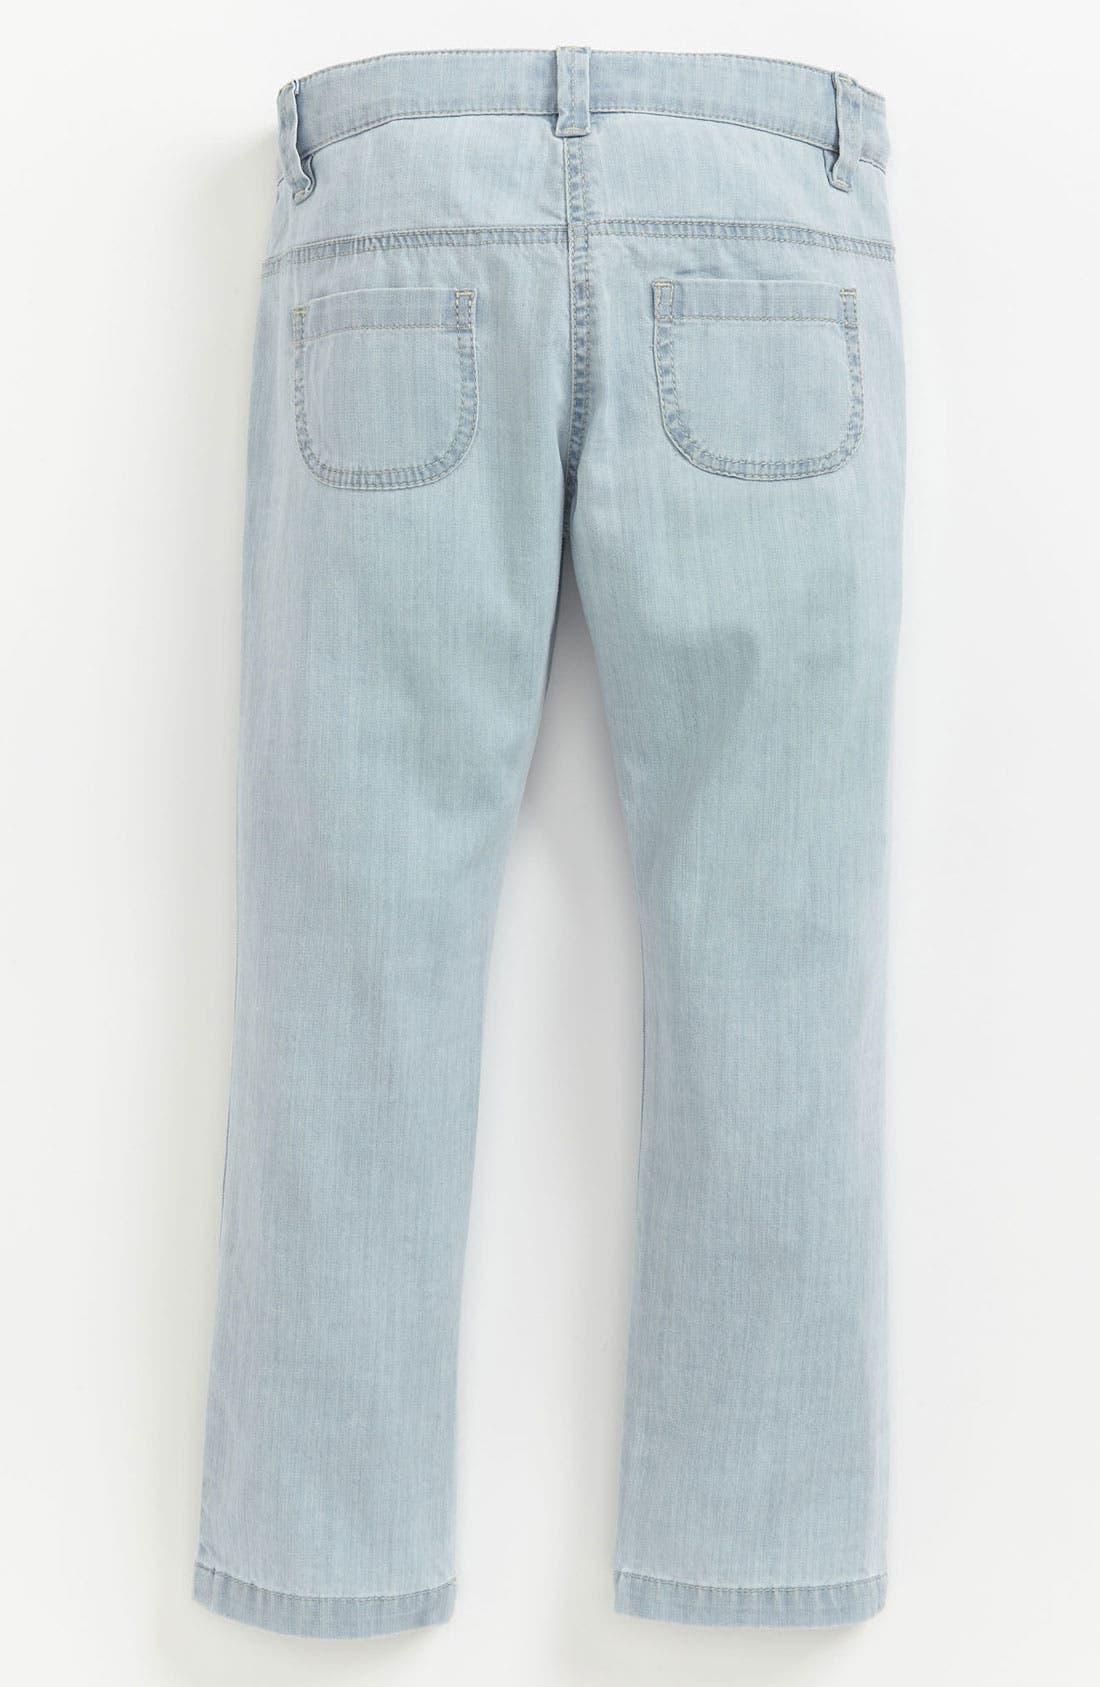 Alternate Image 1 Selected - Chloé Bleached Denim Pants (Toddler, Little Girls & Big Girls)